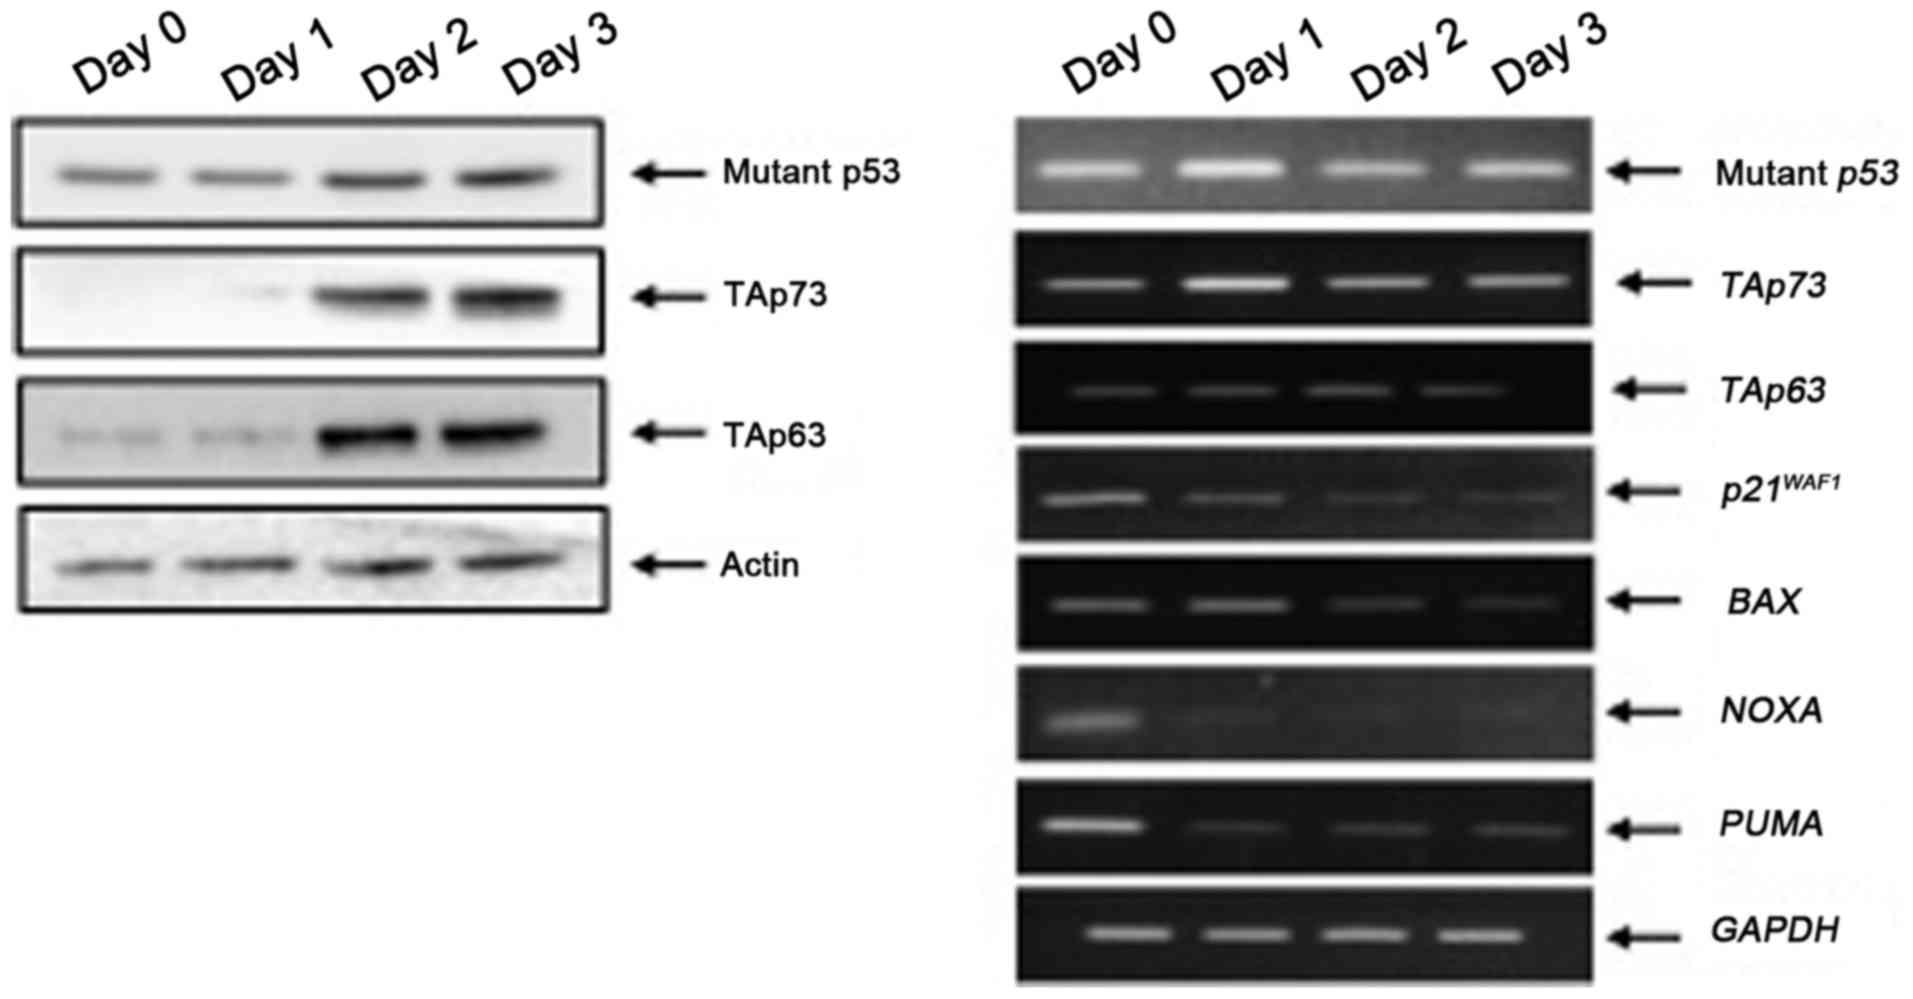 Impact of RUNX2 gene silencing on the gemcitabine